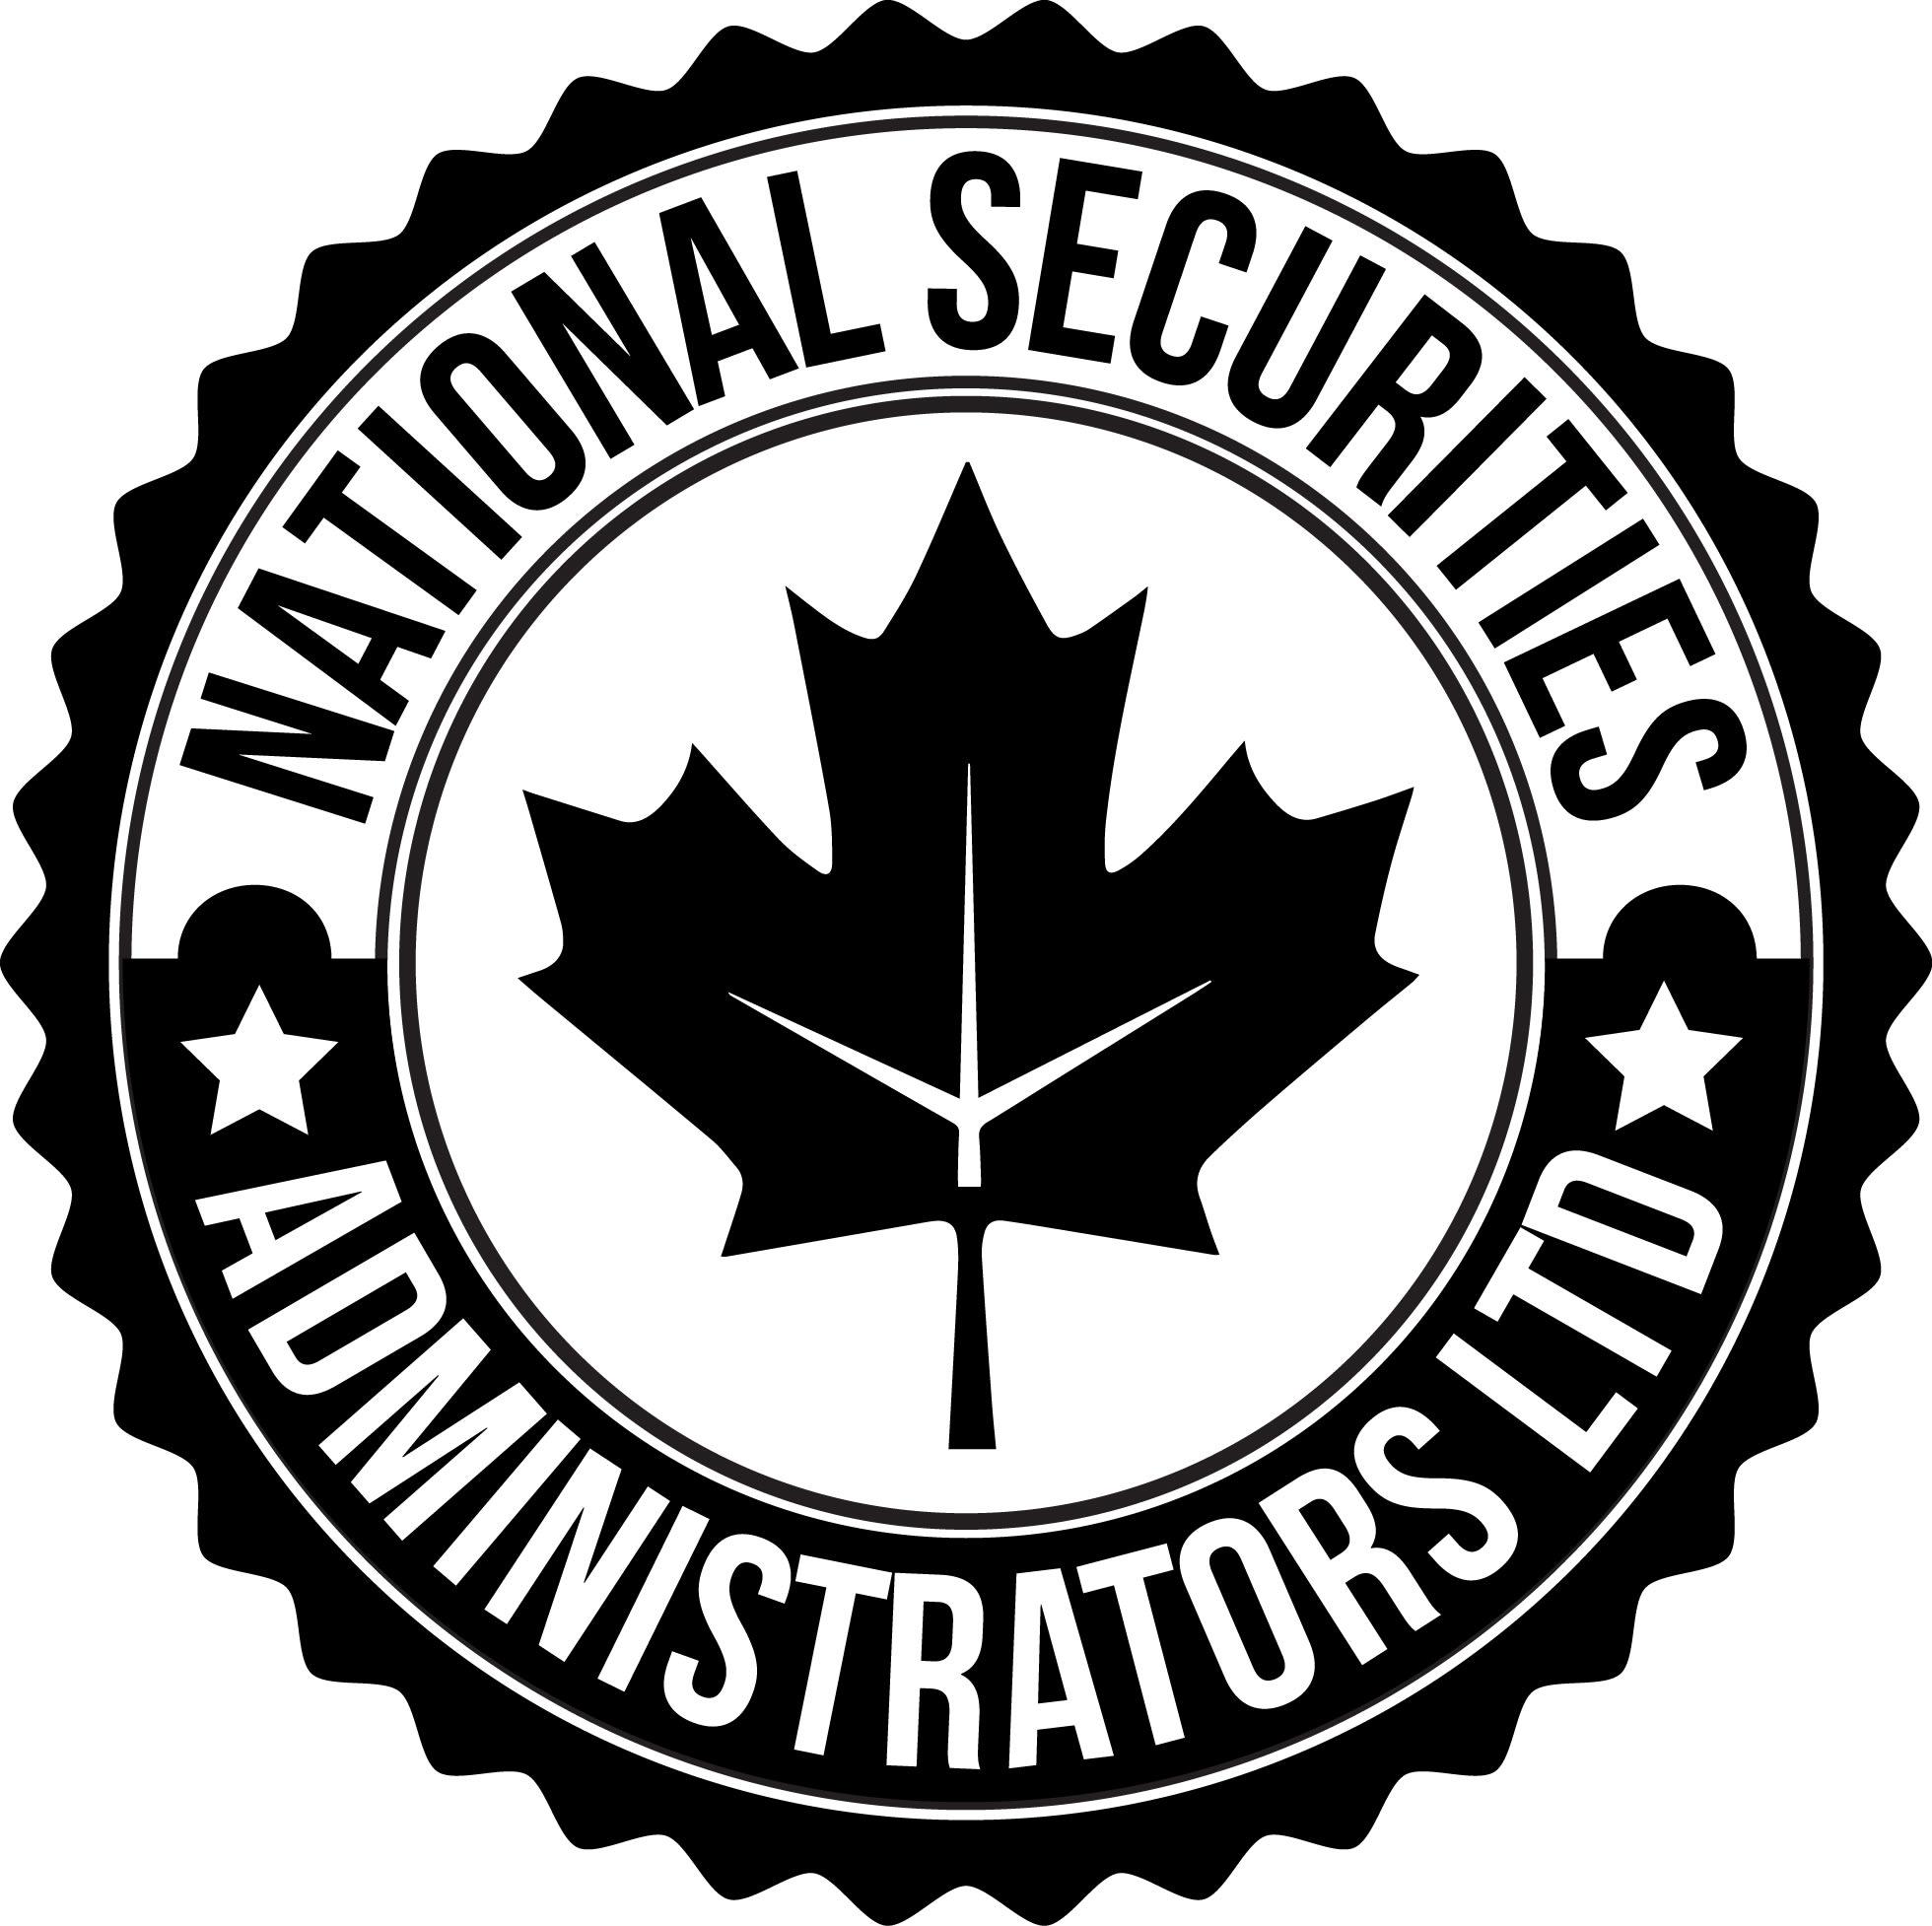 NationalSecuritiesAdministratorsLTD-logo